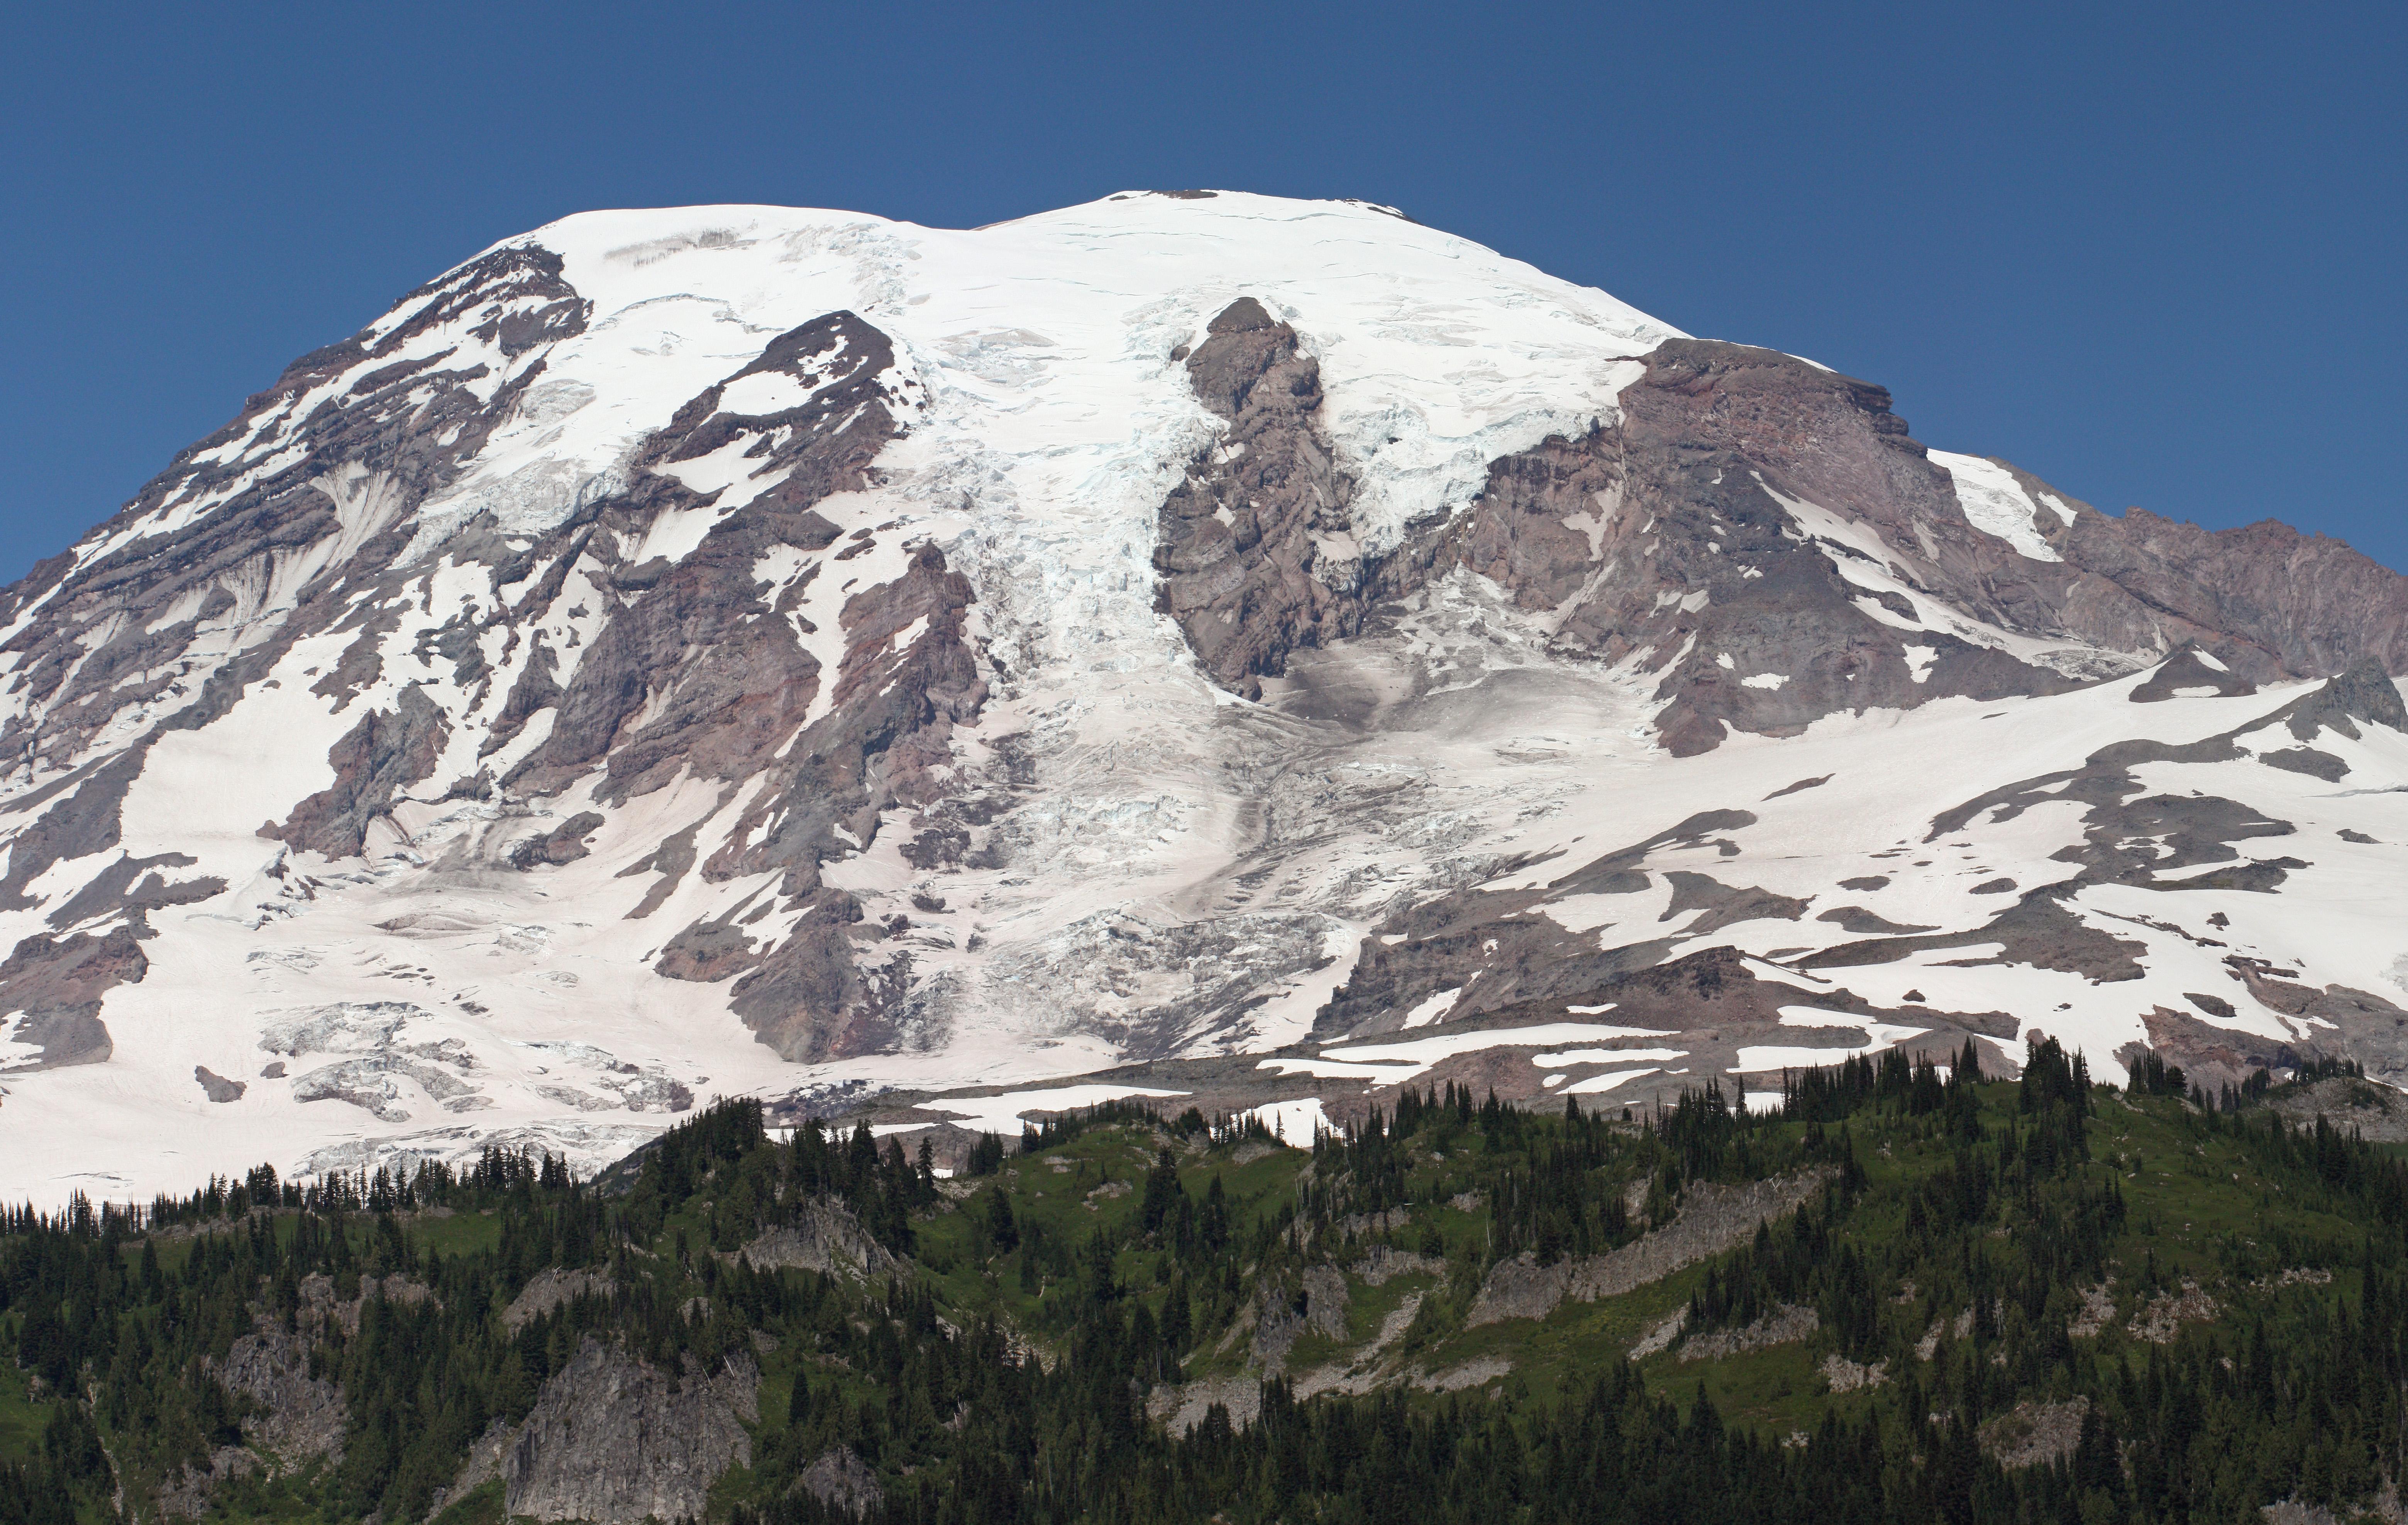 Mount Rainier National Park Hotels